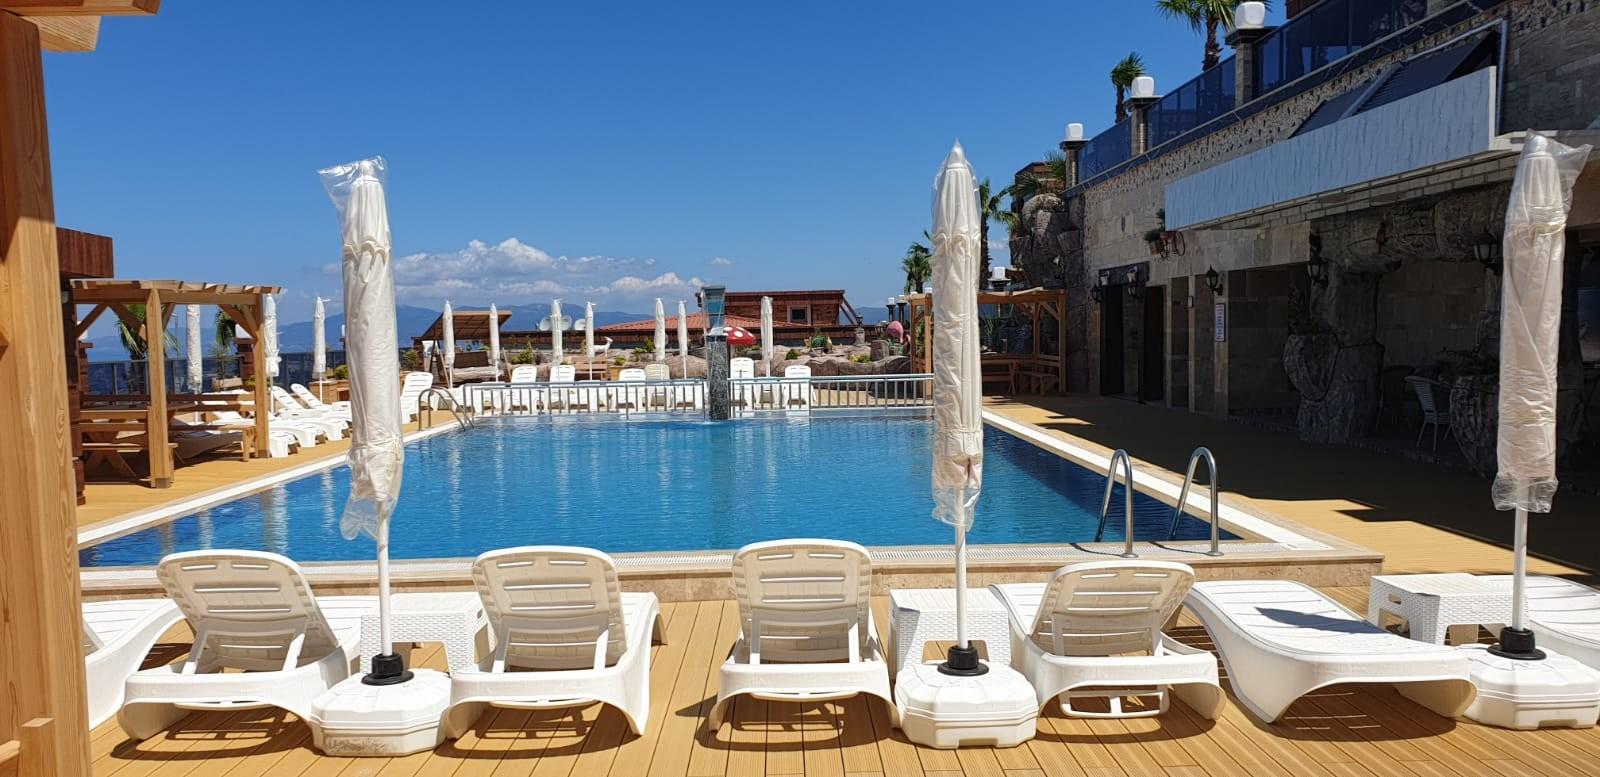 Luxury Apartments in Ladies Beach Kusadasi with Panoramic Sea Views